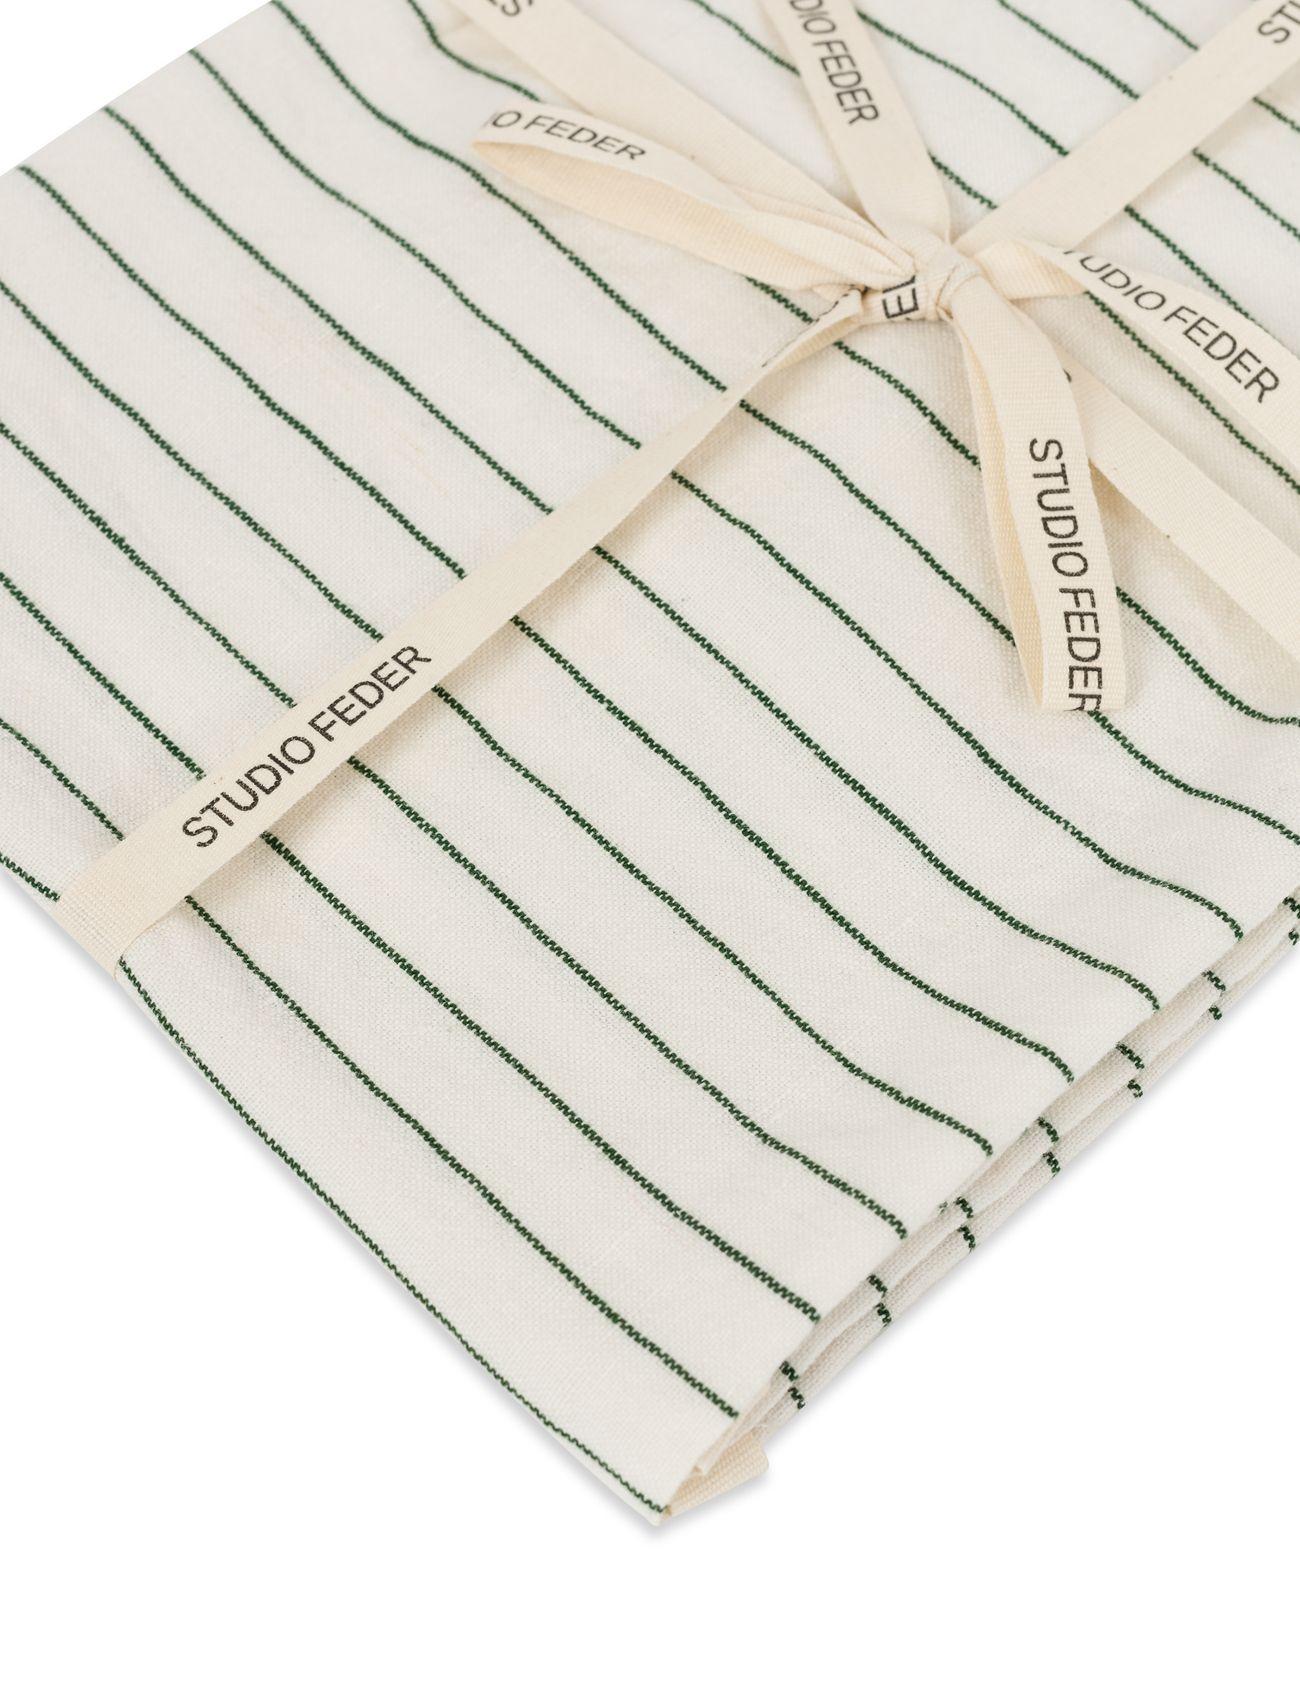 STUDIO FEDER - TEA TOWEL - FOREST PIN - ręczniki kuchenne - forest pin - 1